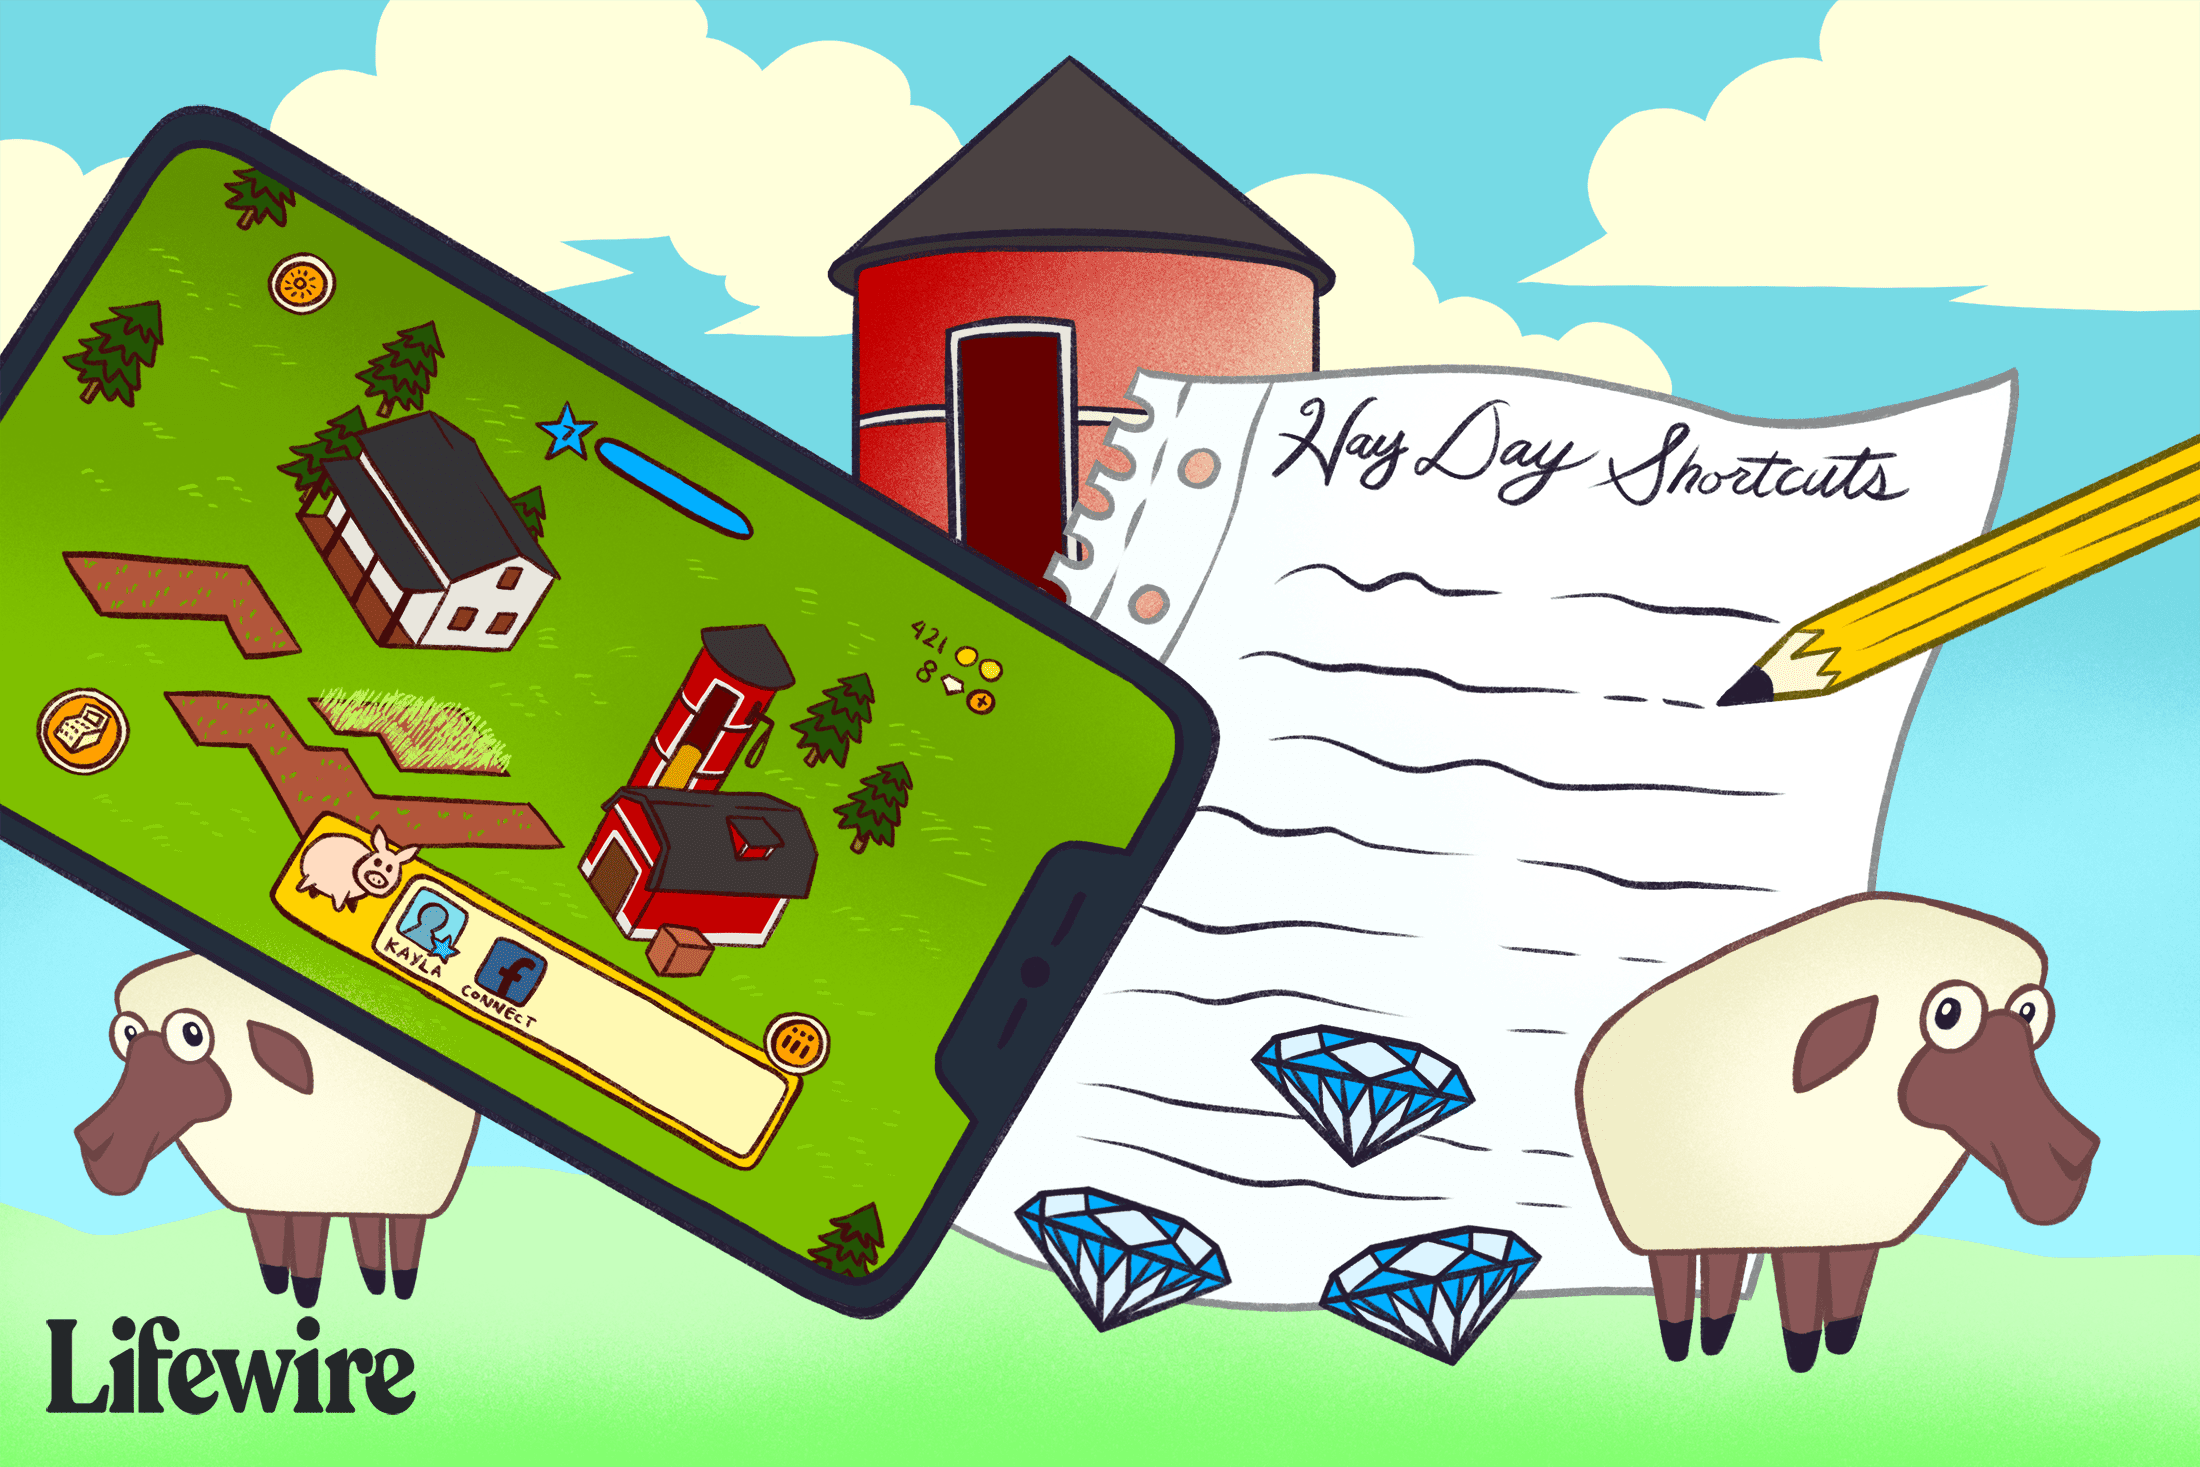 hay day cheats codes and free diamonds 4169611 699bfaaaf12f4d508b7ec3f085aab2e7 - Free Game Cheats